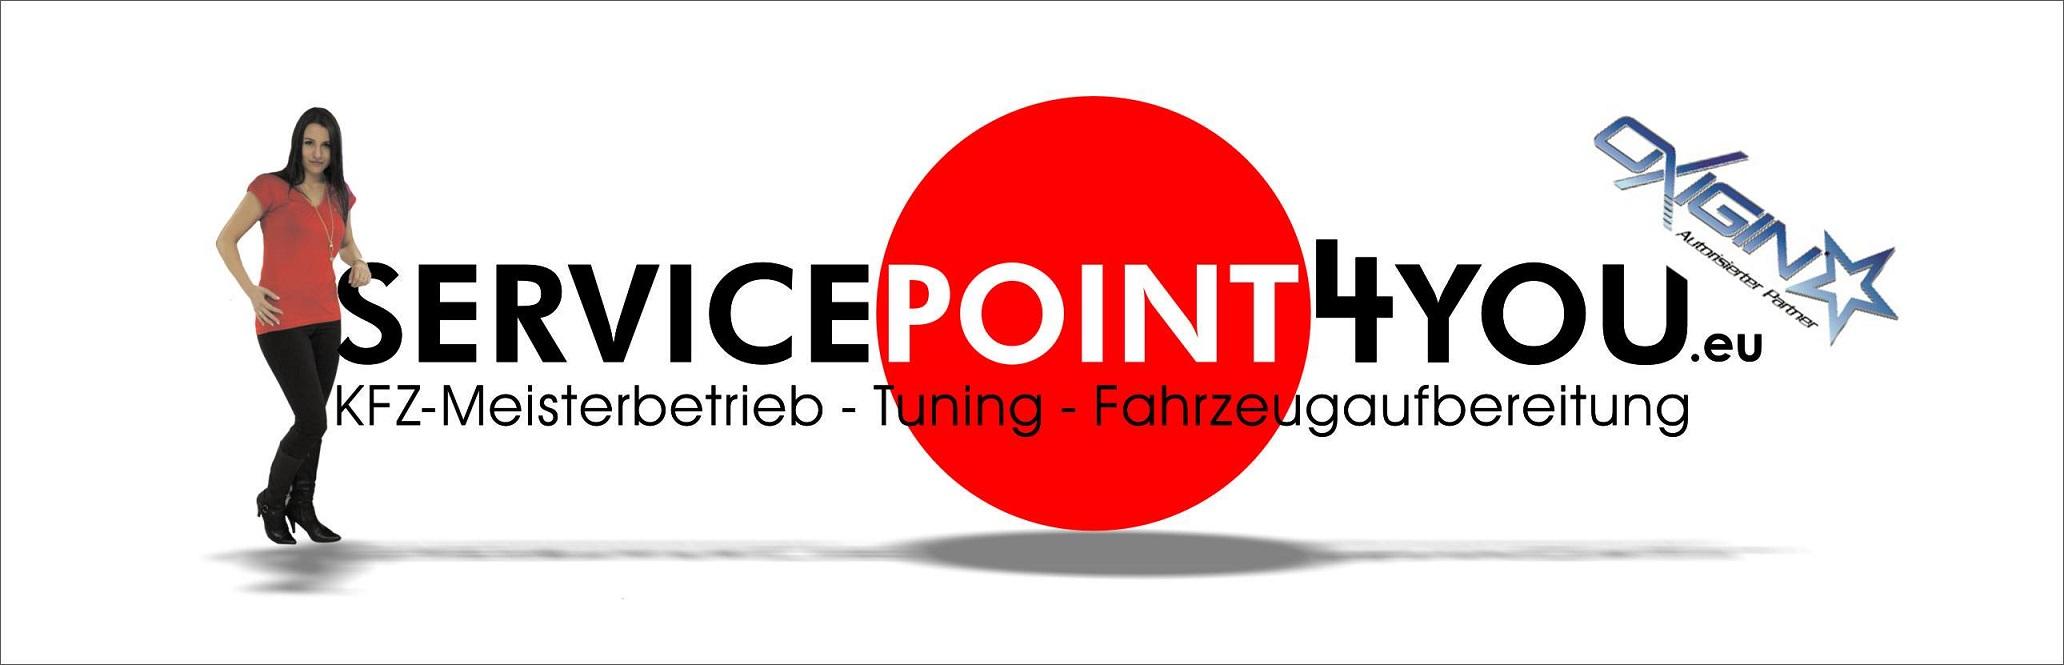 Service Point 4 You logo